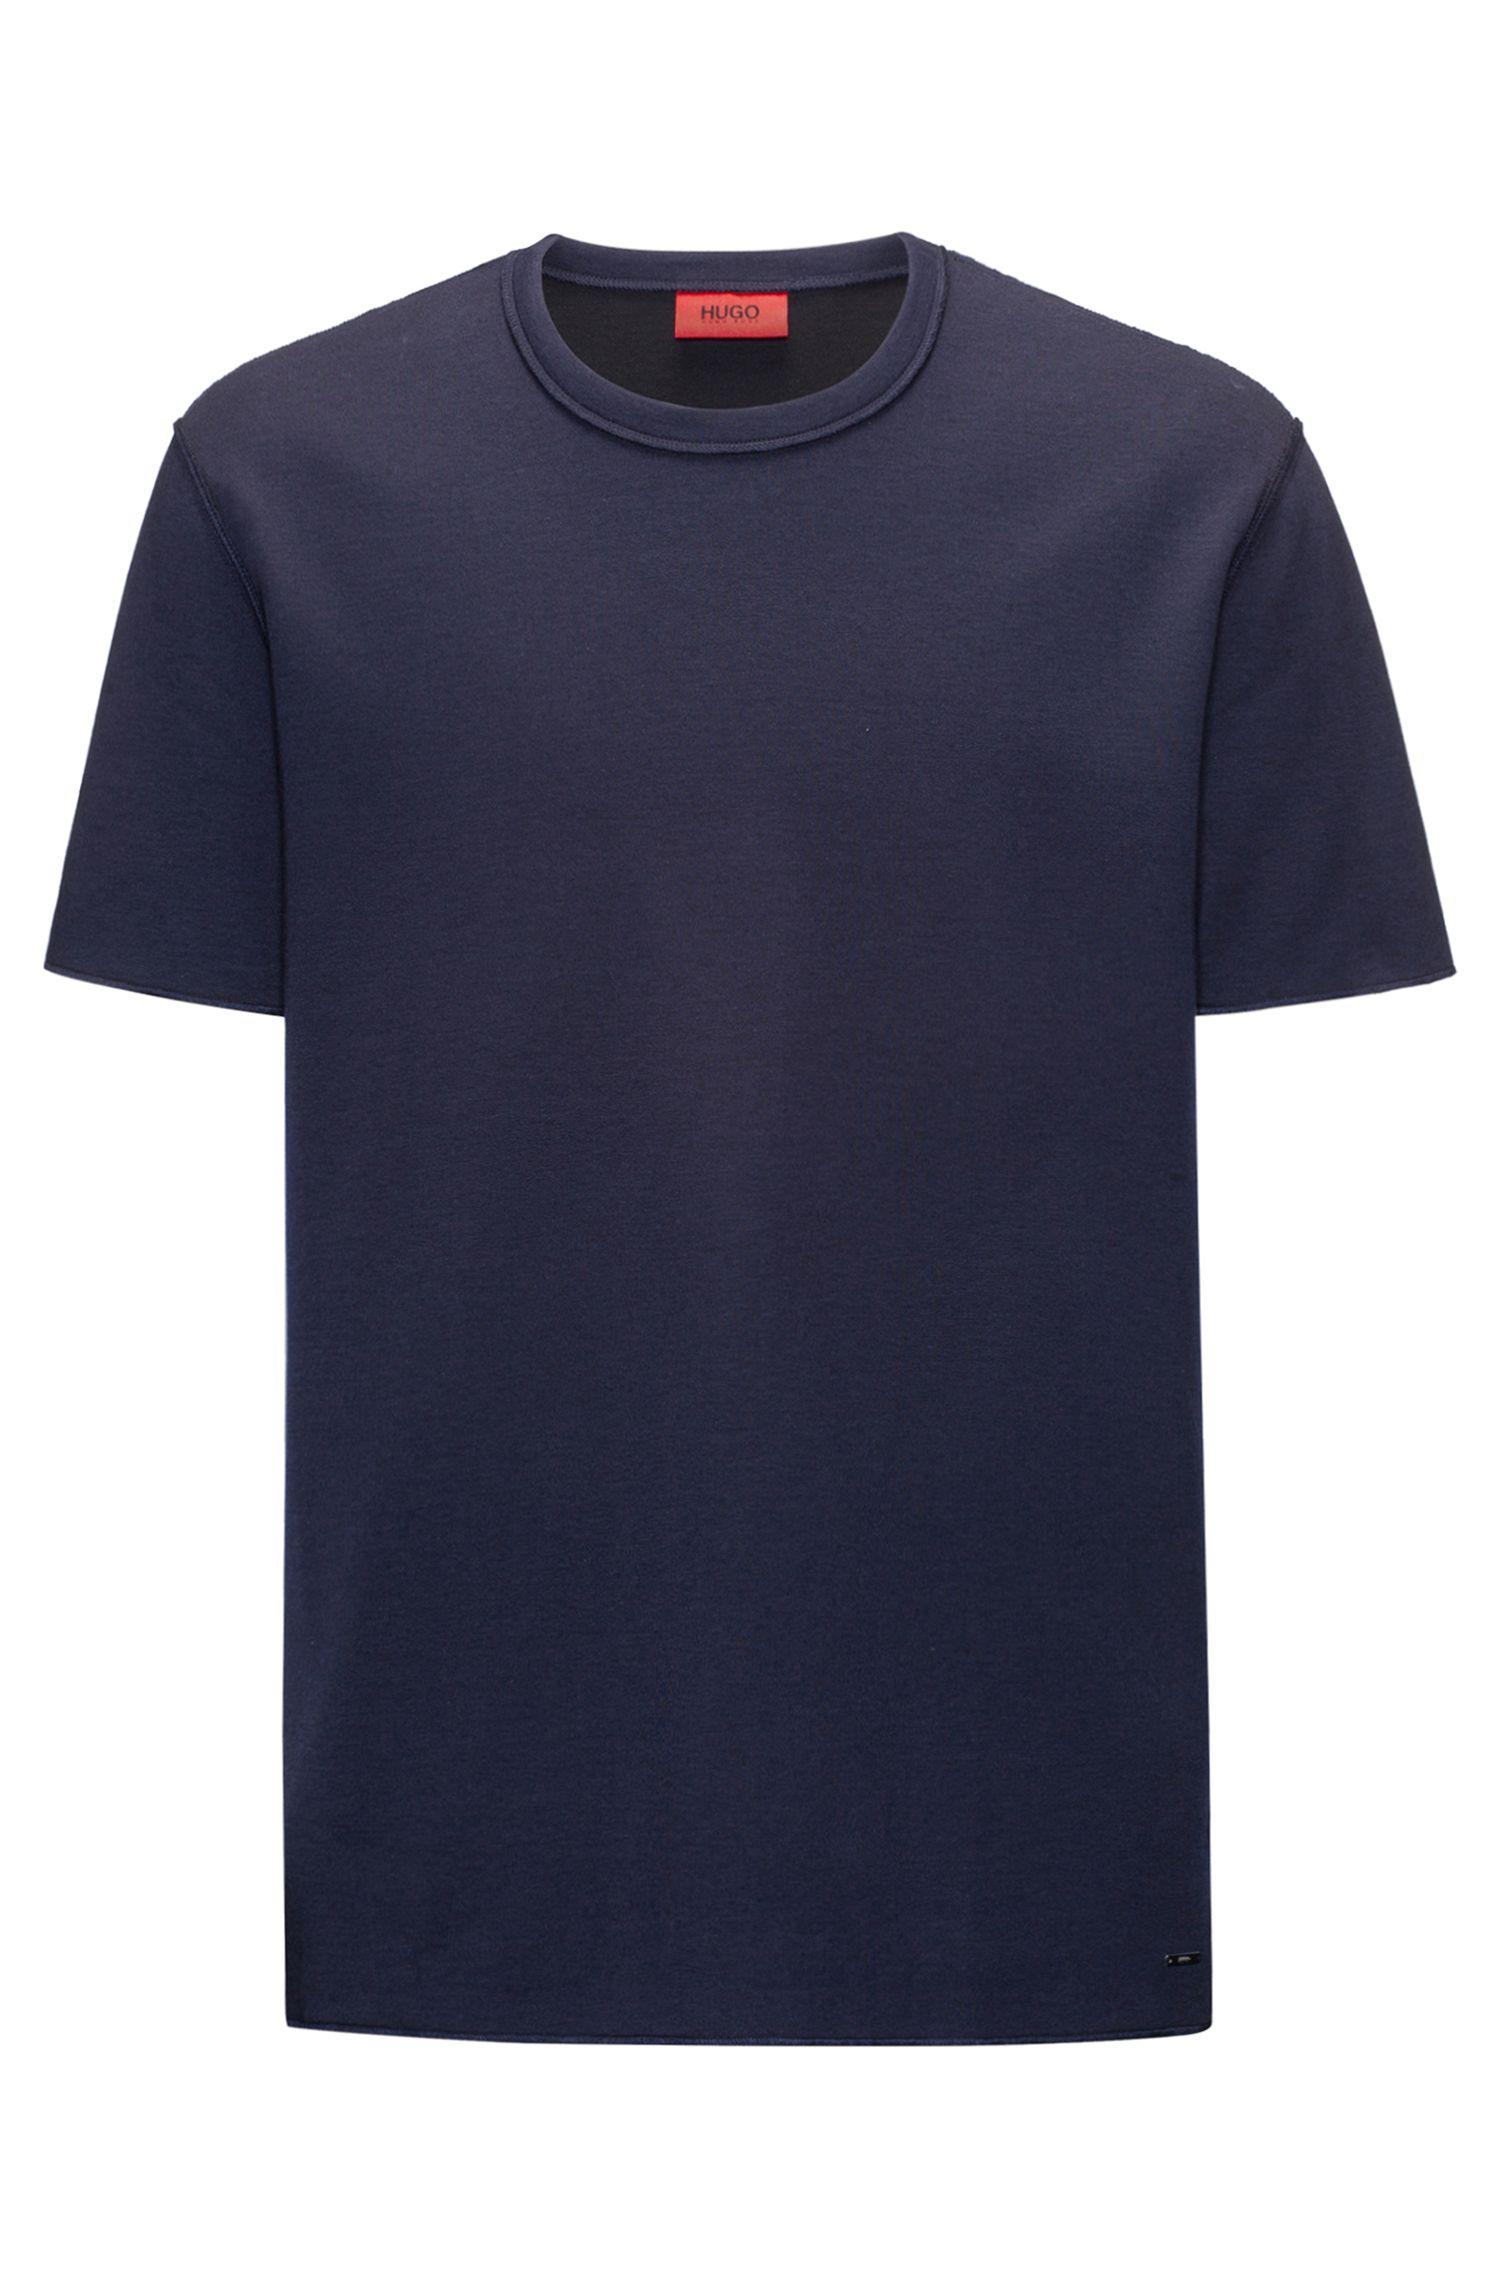 Cotton Blend T-Shirt | Dendrix